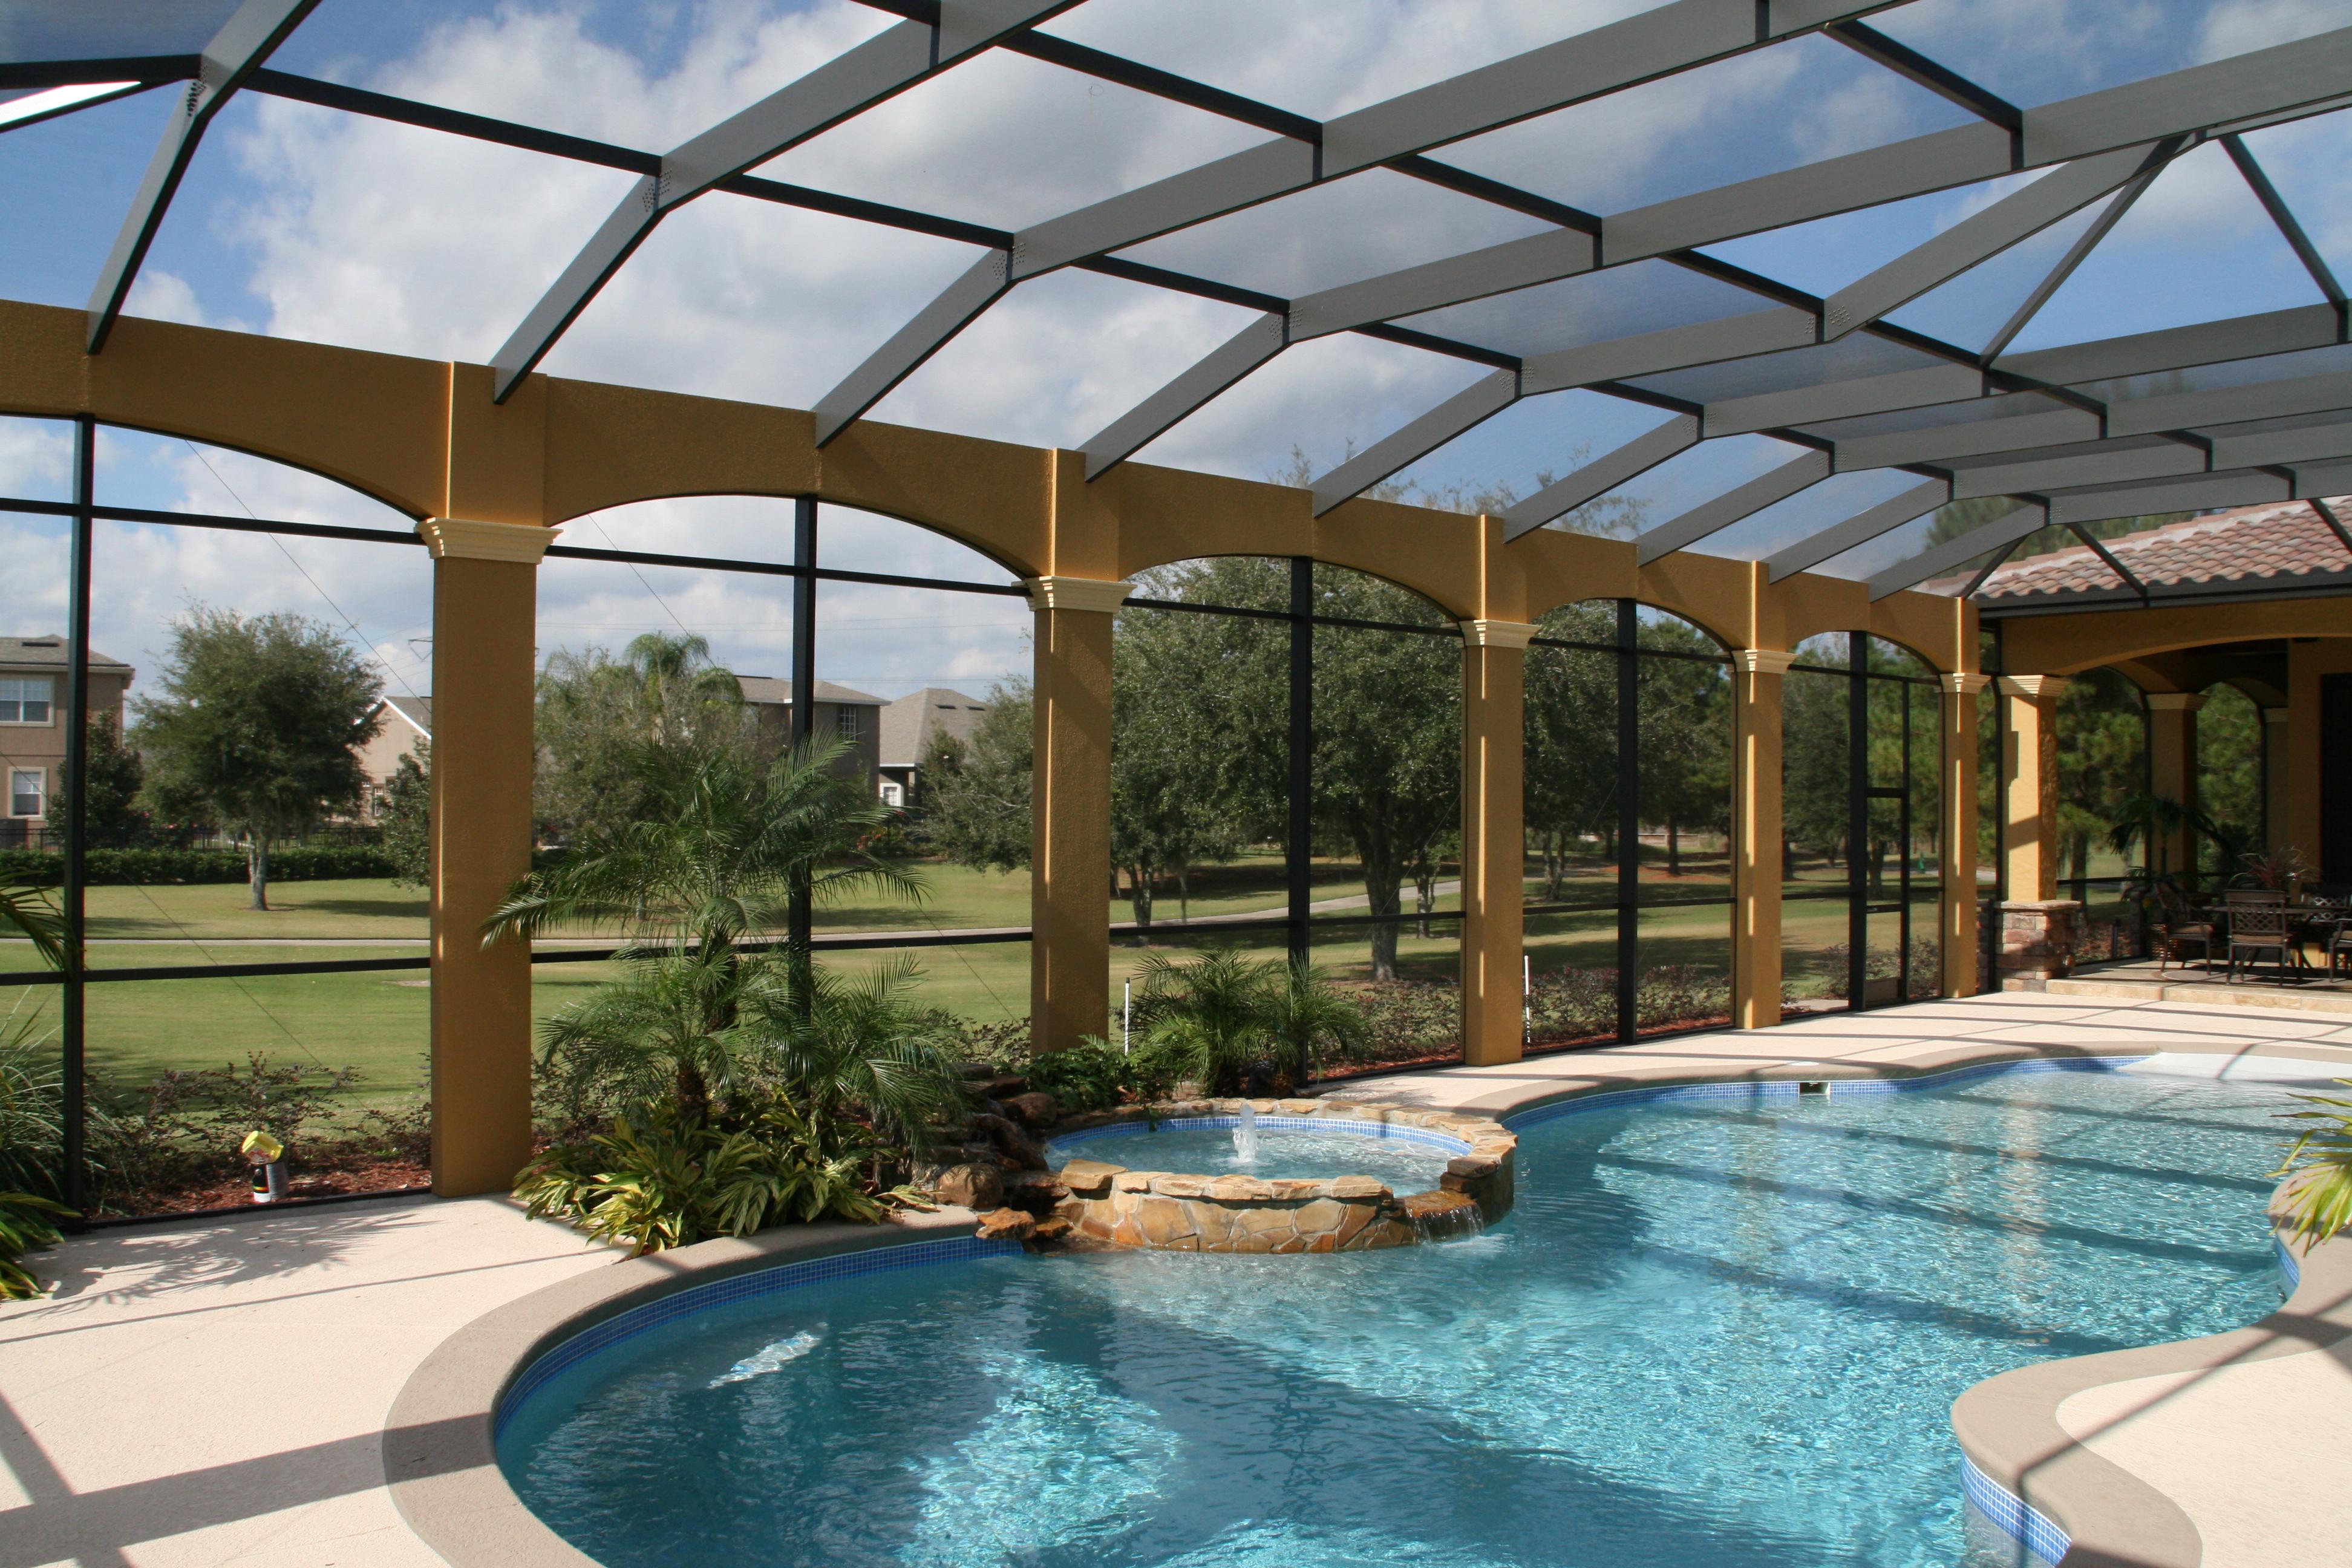 Pool Enclosures Savannah Ga Charleston Sc